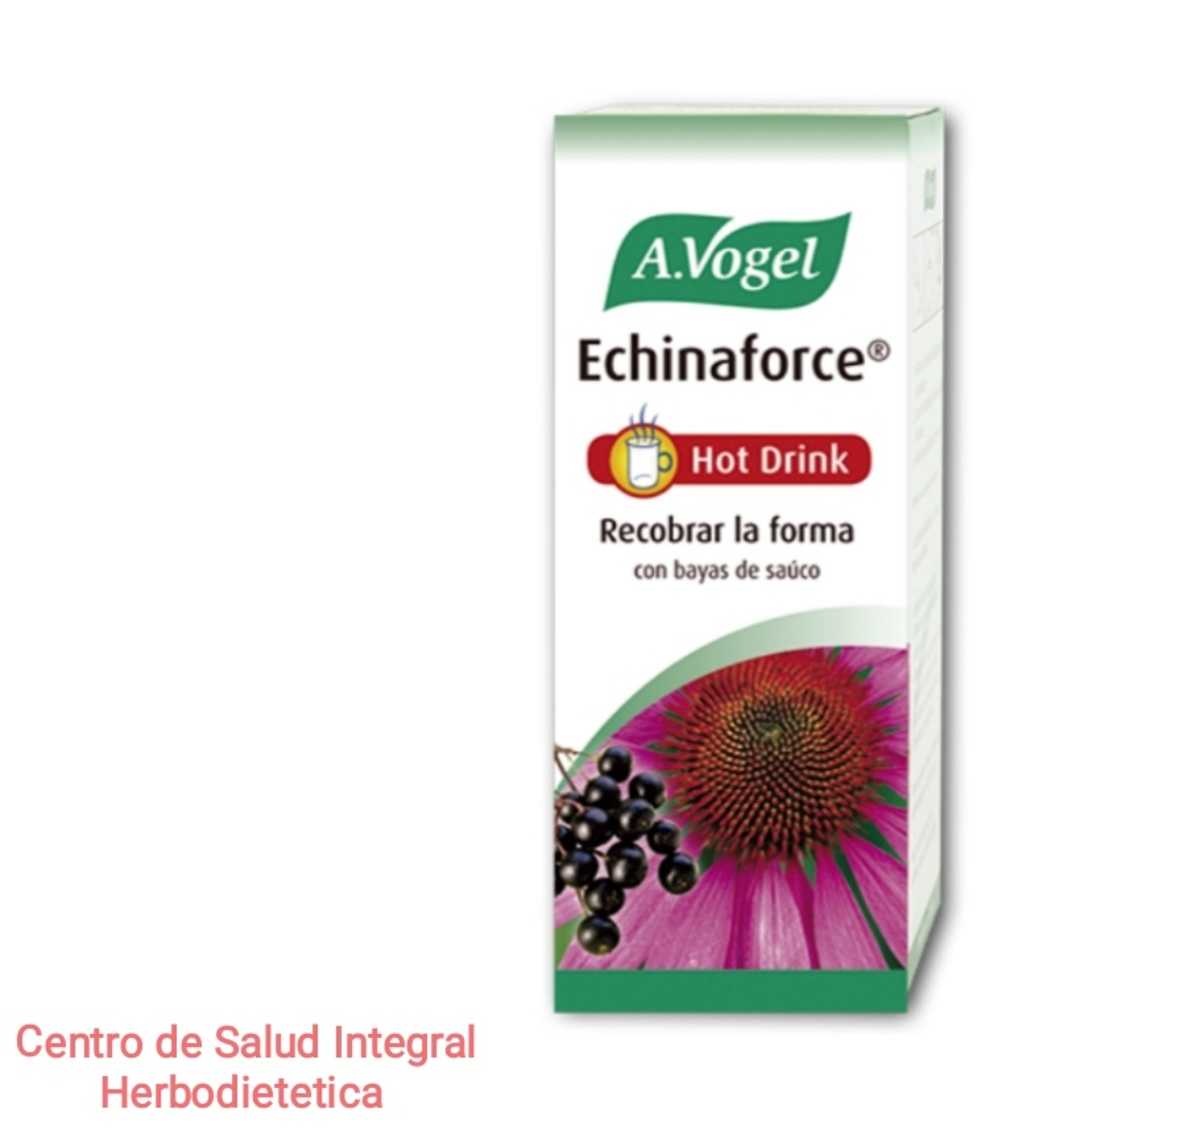 A.Vogel - Echinaforce Hot Drink - 100ml